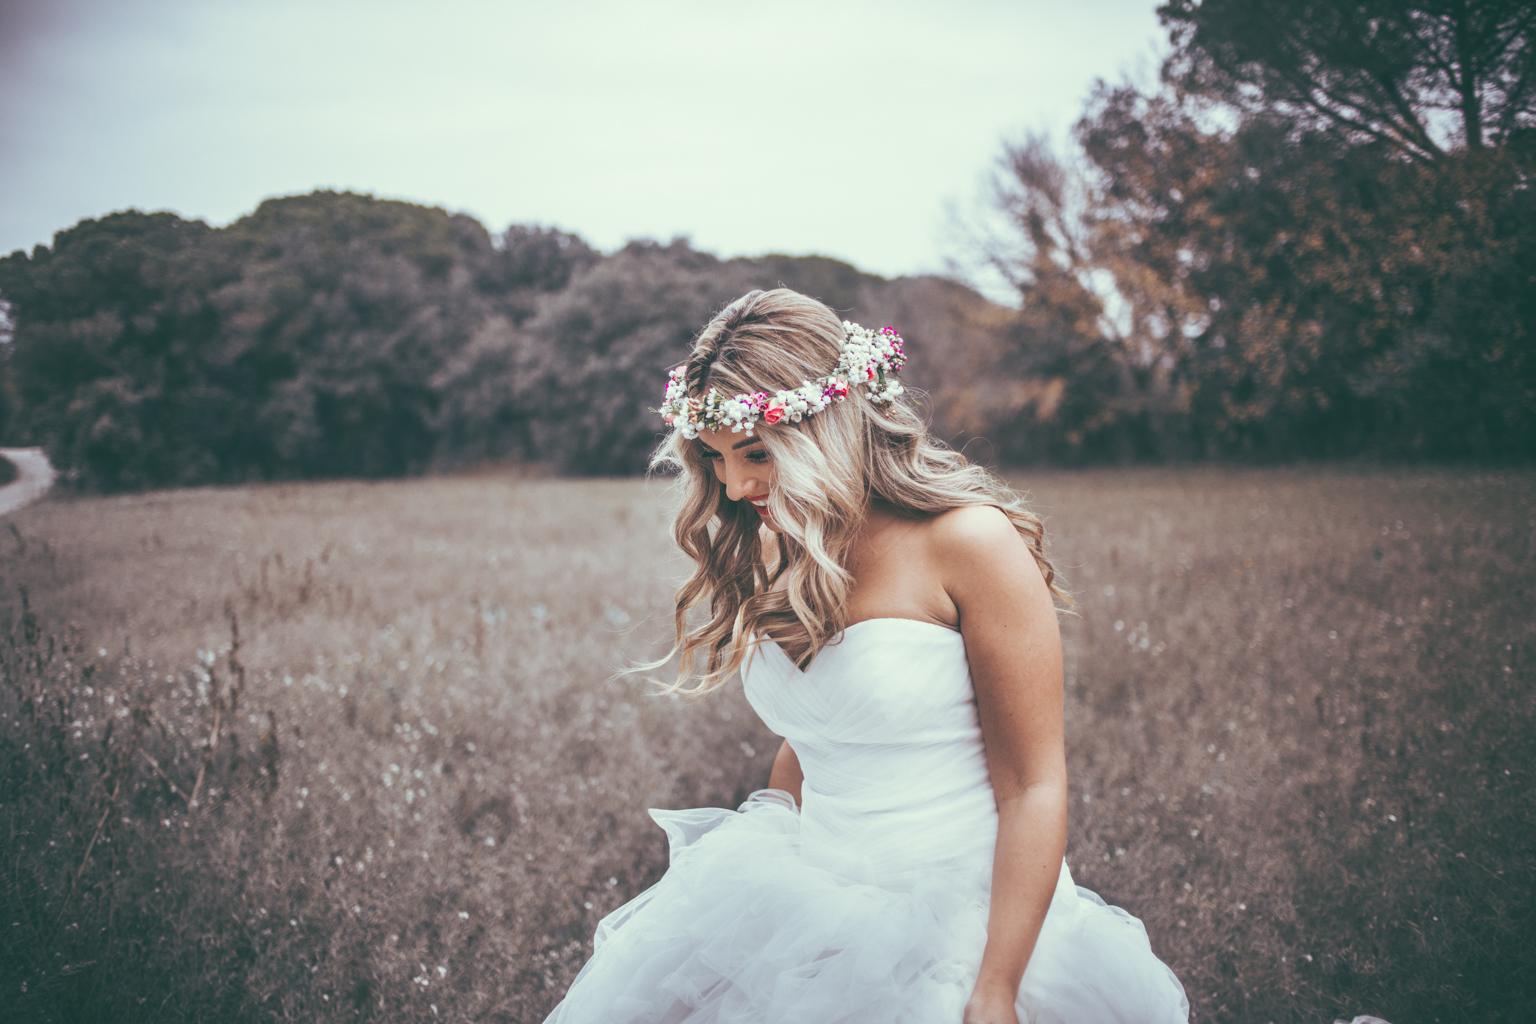 Fotógrafo de Postboda :: Fotógrafo romántico :: Boda de Invierno :: Corona de Flores :: Boda en el Campo :: Boda en familia :: Fotógrafo de boda :: Fotos de boda diferentes :: Postboda en el Campo :: Fotógrafo de bodas Barcelona